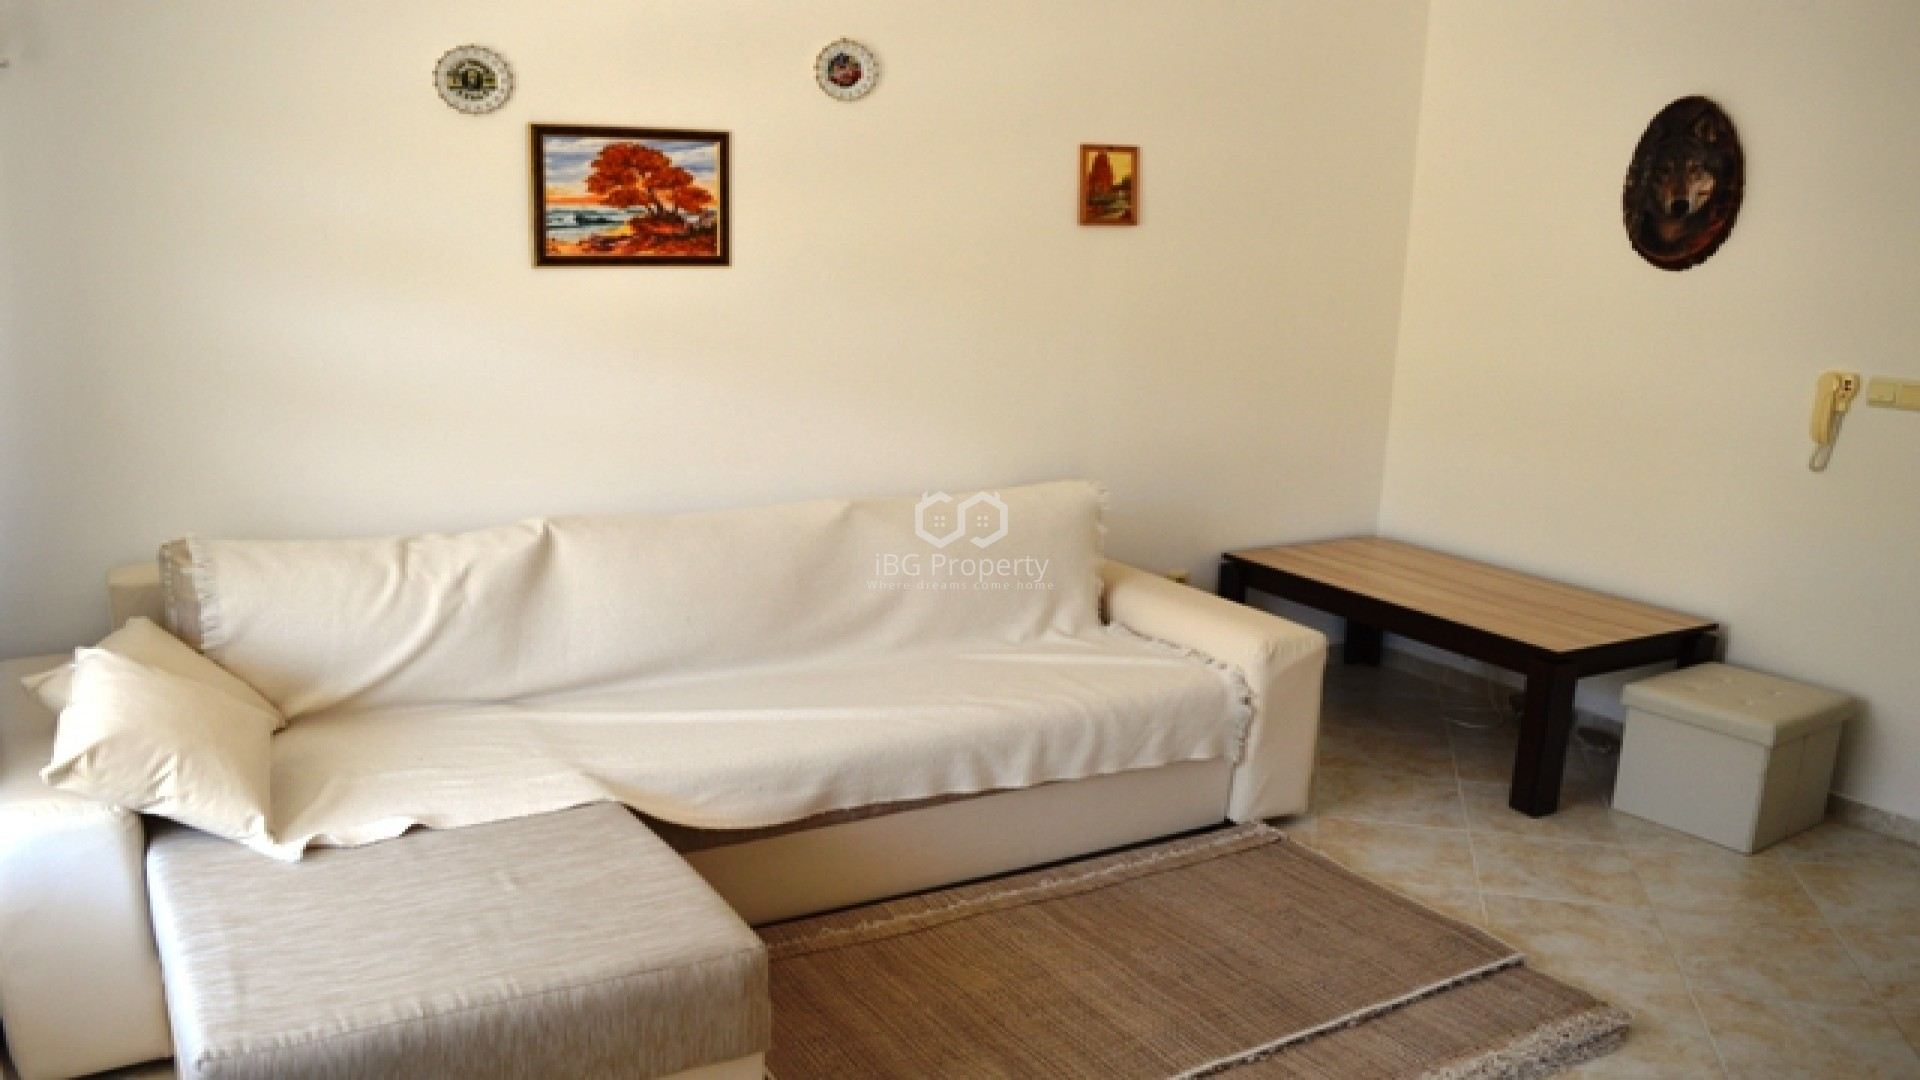 Едностаен апартамент Кошарица 32 m2